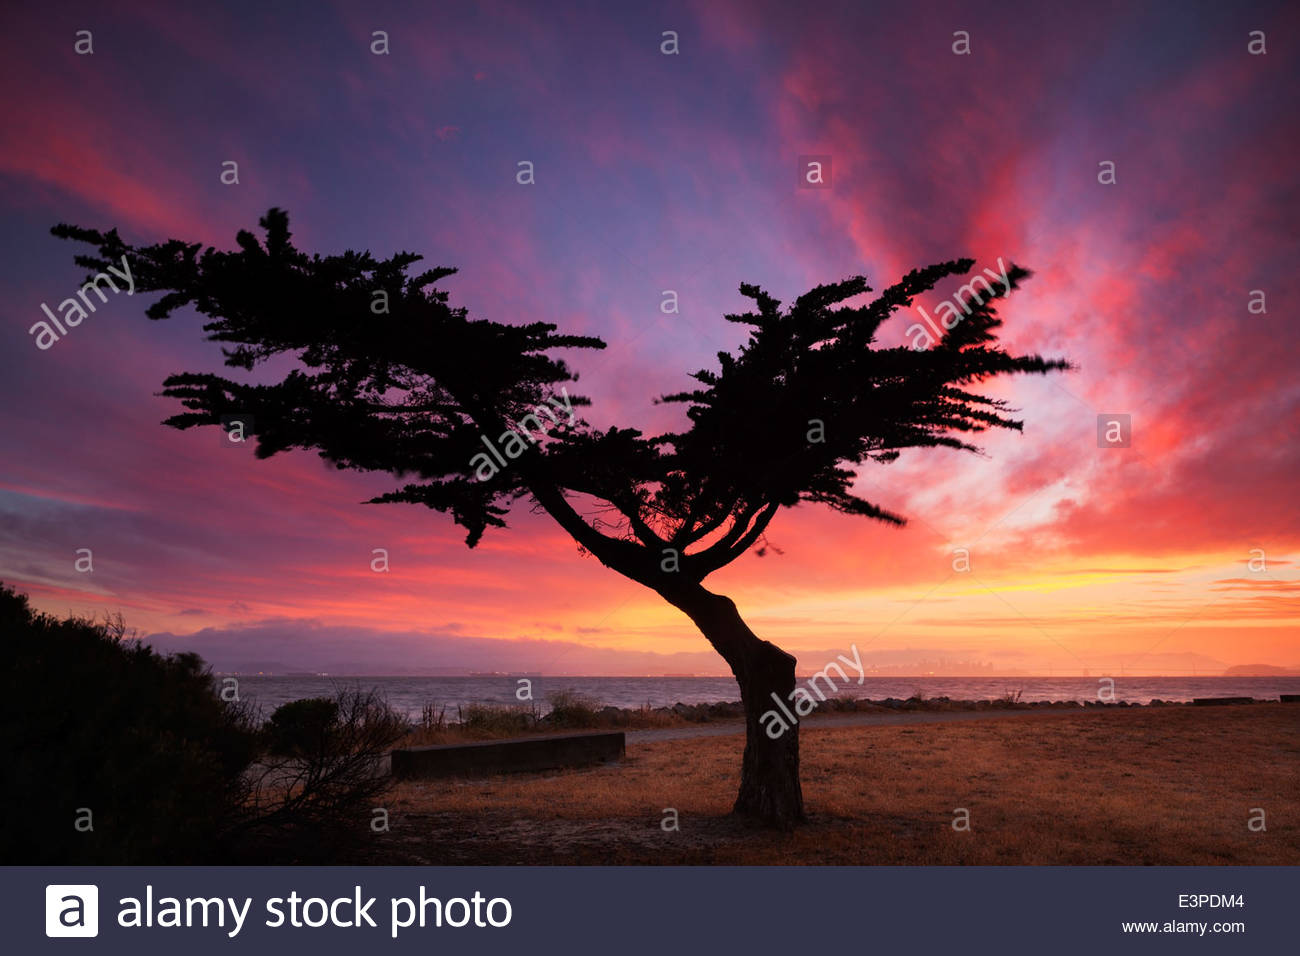 Lonesome Cypress Tree, Alameda, California - Stock Image